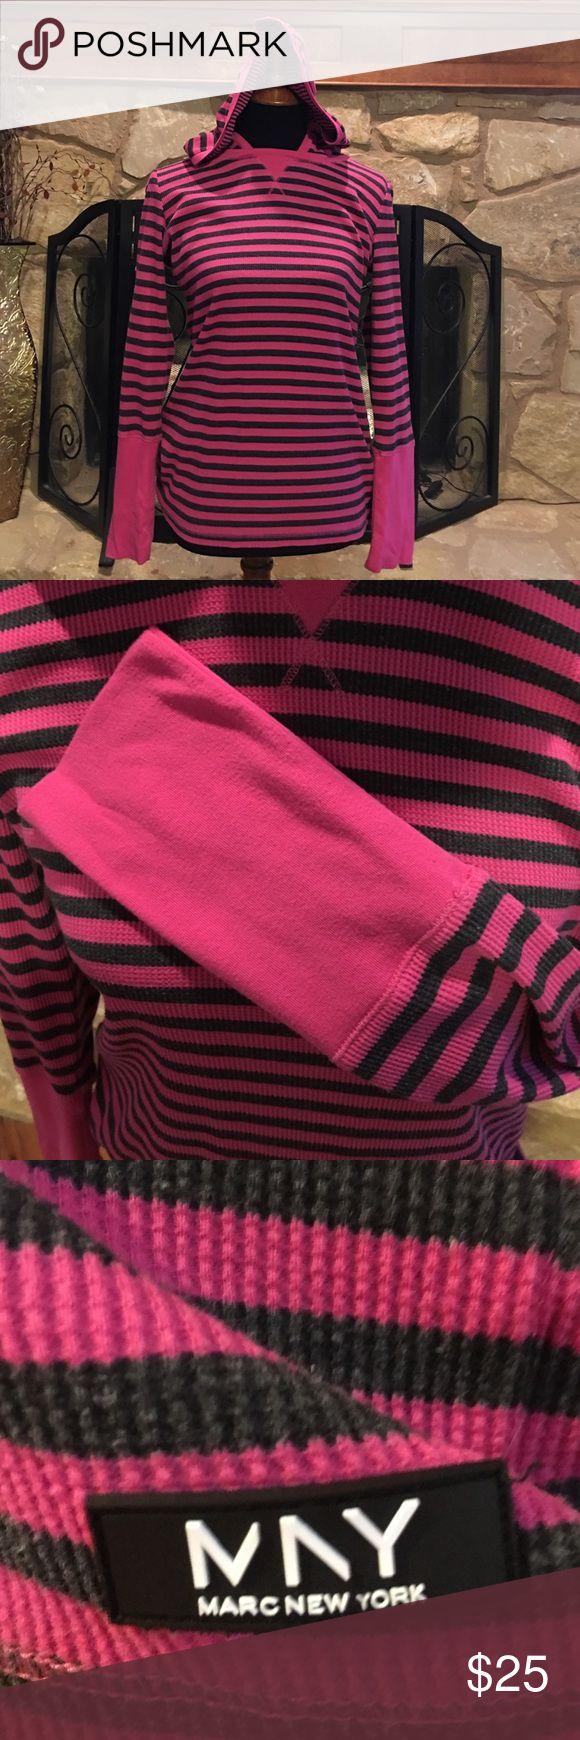 """Marc New York Andrew Marc"" Pink & Grey Hooded Top ""Marc New York Andrew Marc"" Pink & Grey Hooded Top ""Marc New York Andrew Marc"" Pink & Grey Hooded Top Tops Sweatshirts & Hoodies"